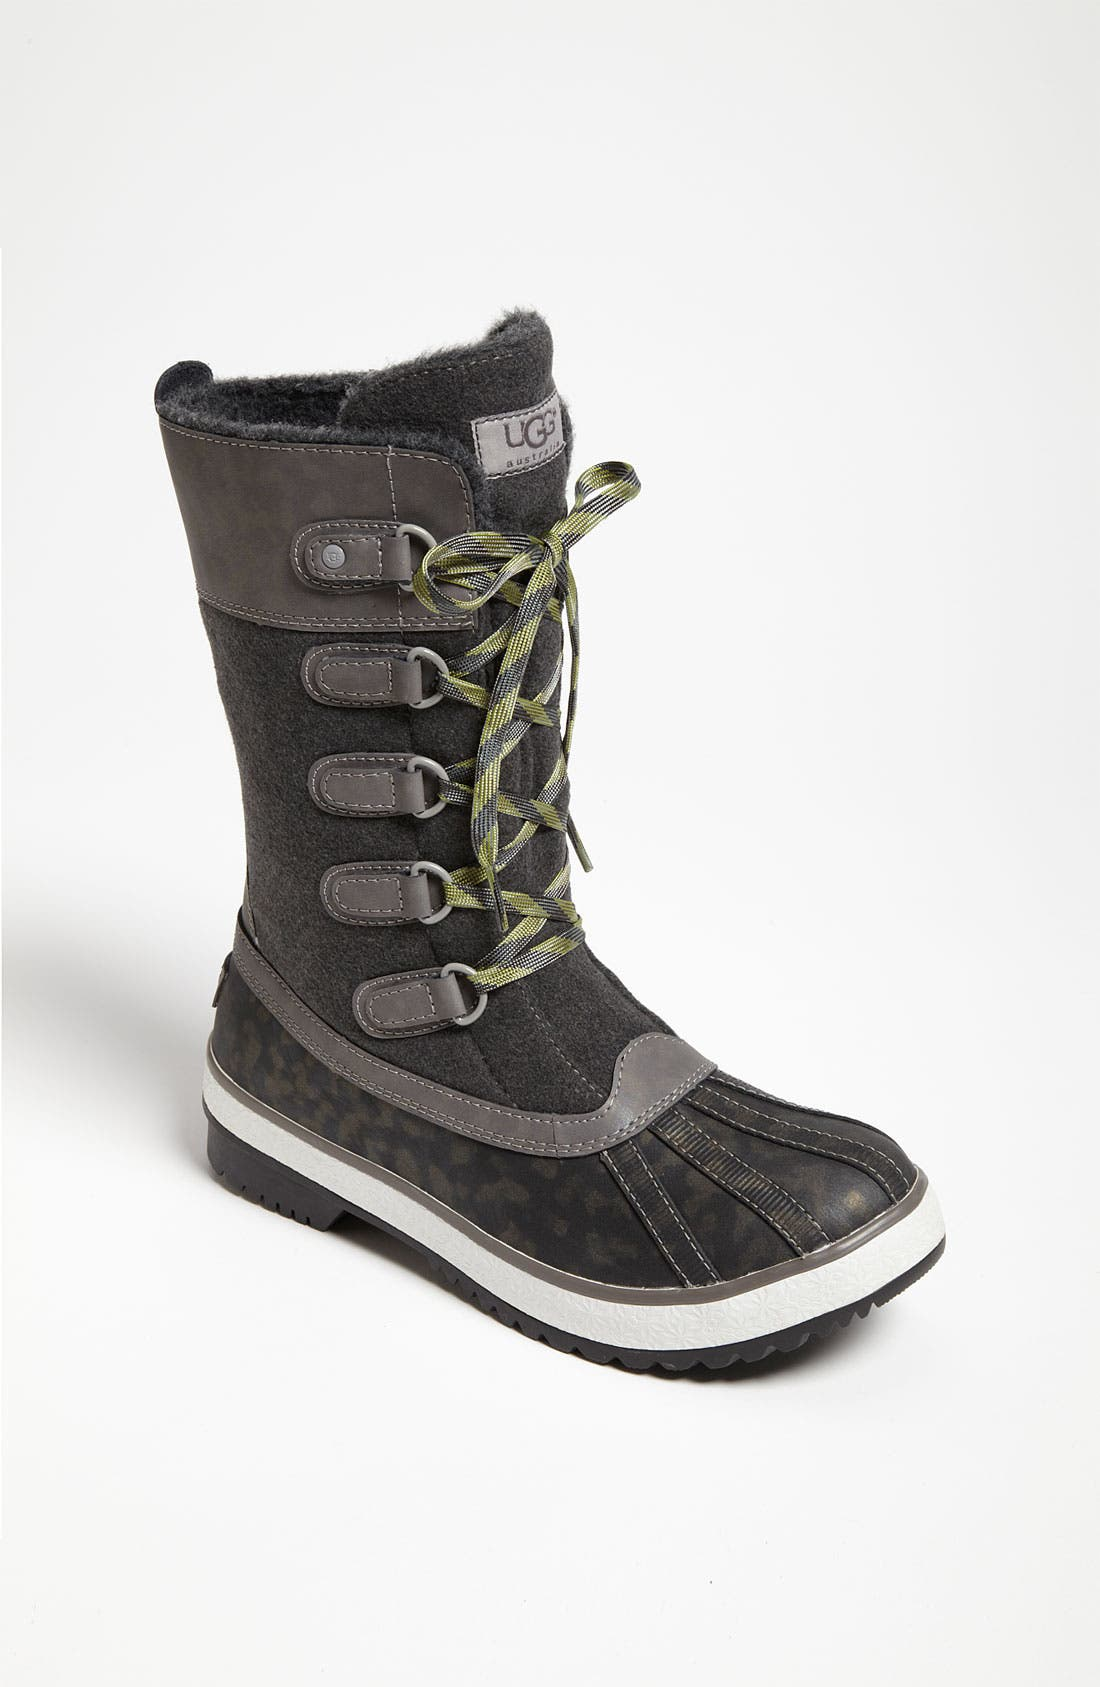 Alternate Image 1 Selected - UGG® Australia 'Baroness' Boot (Women)